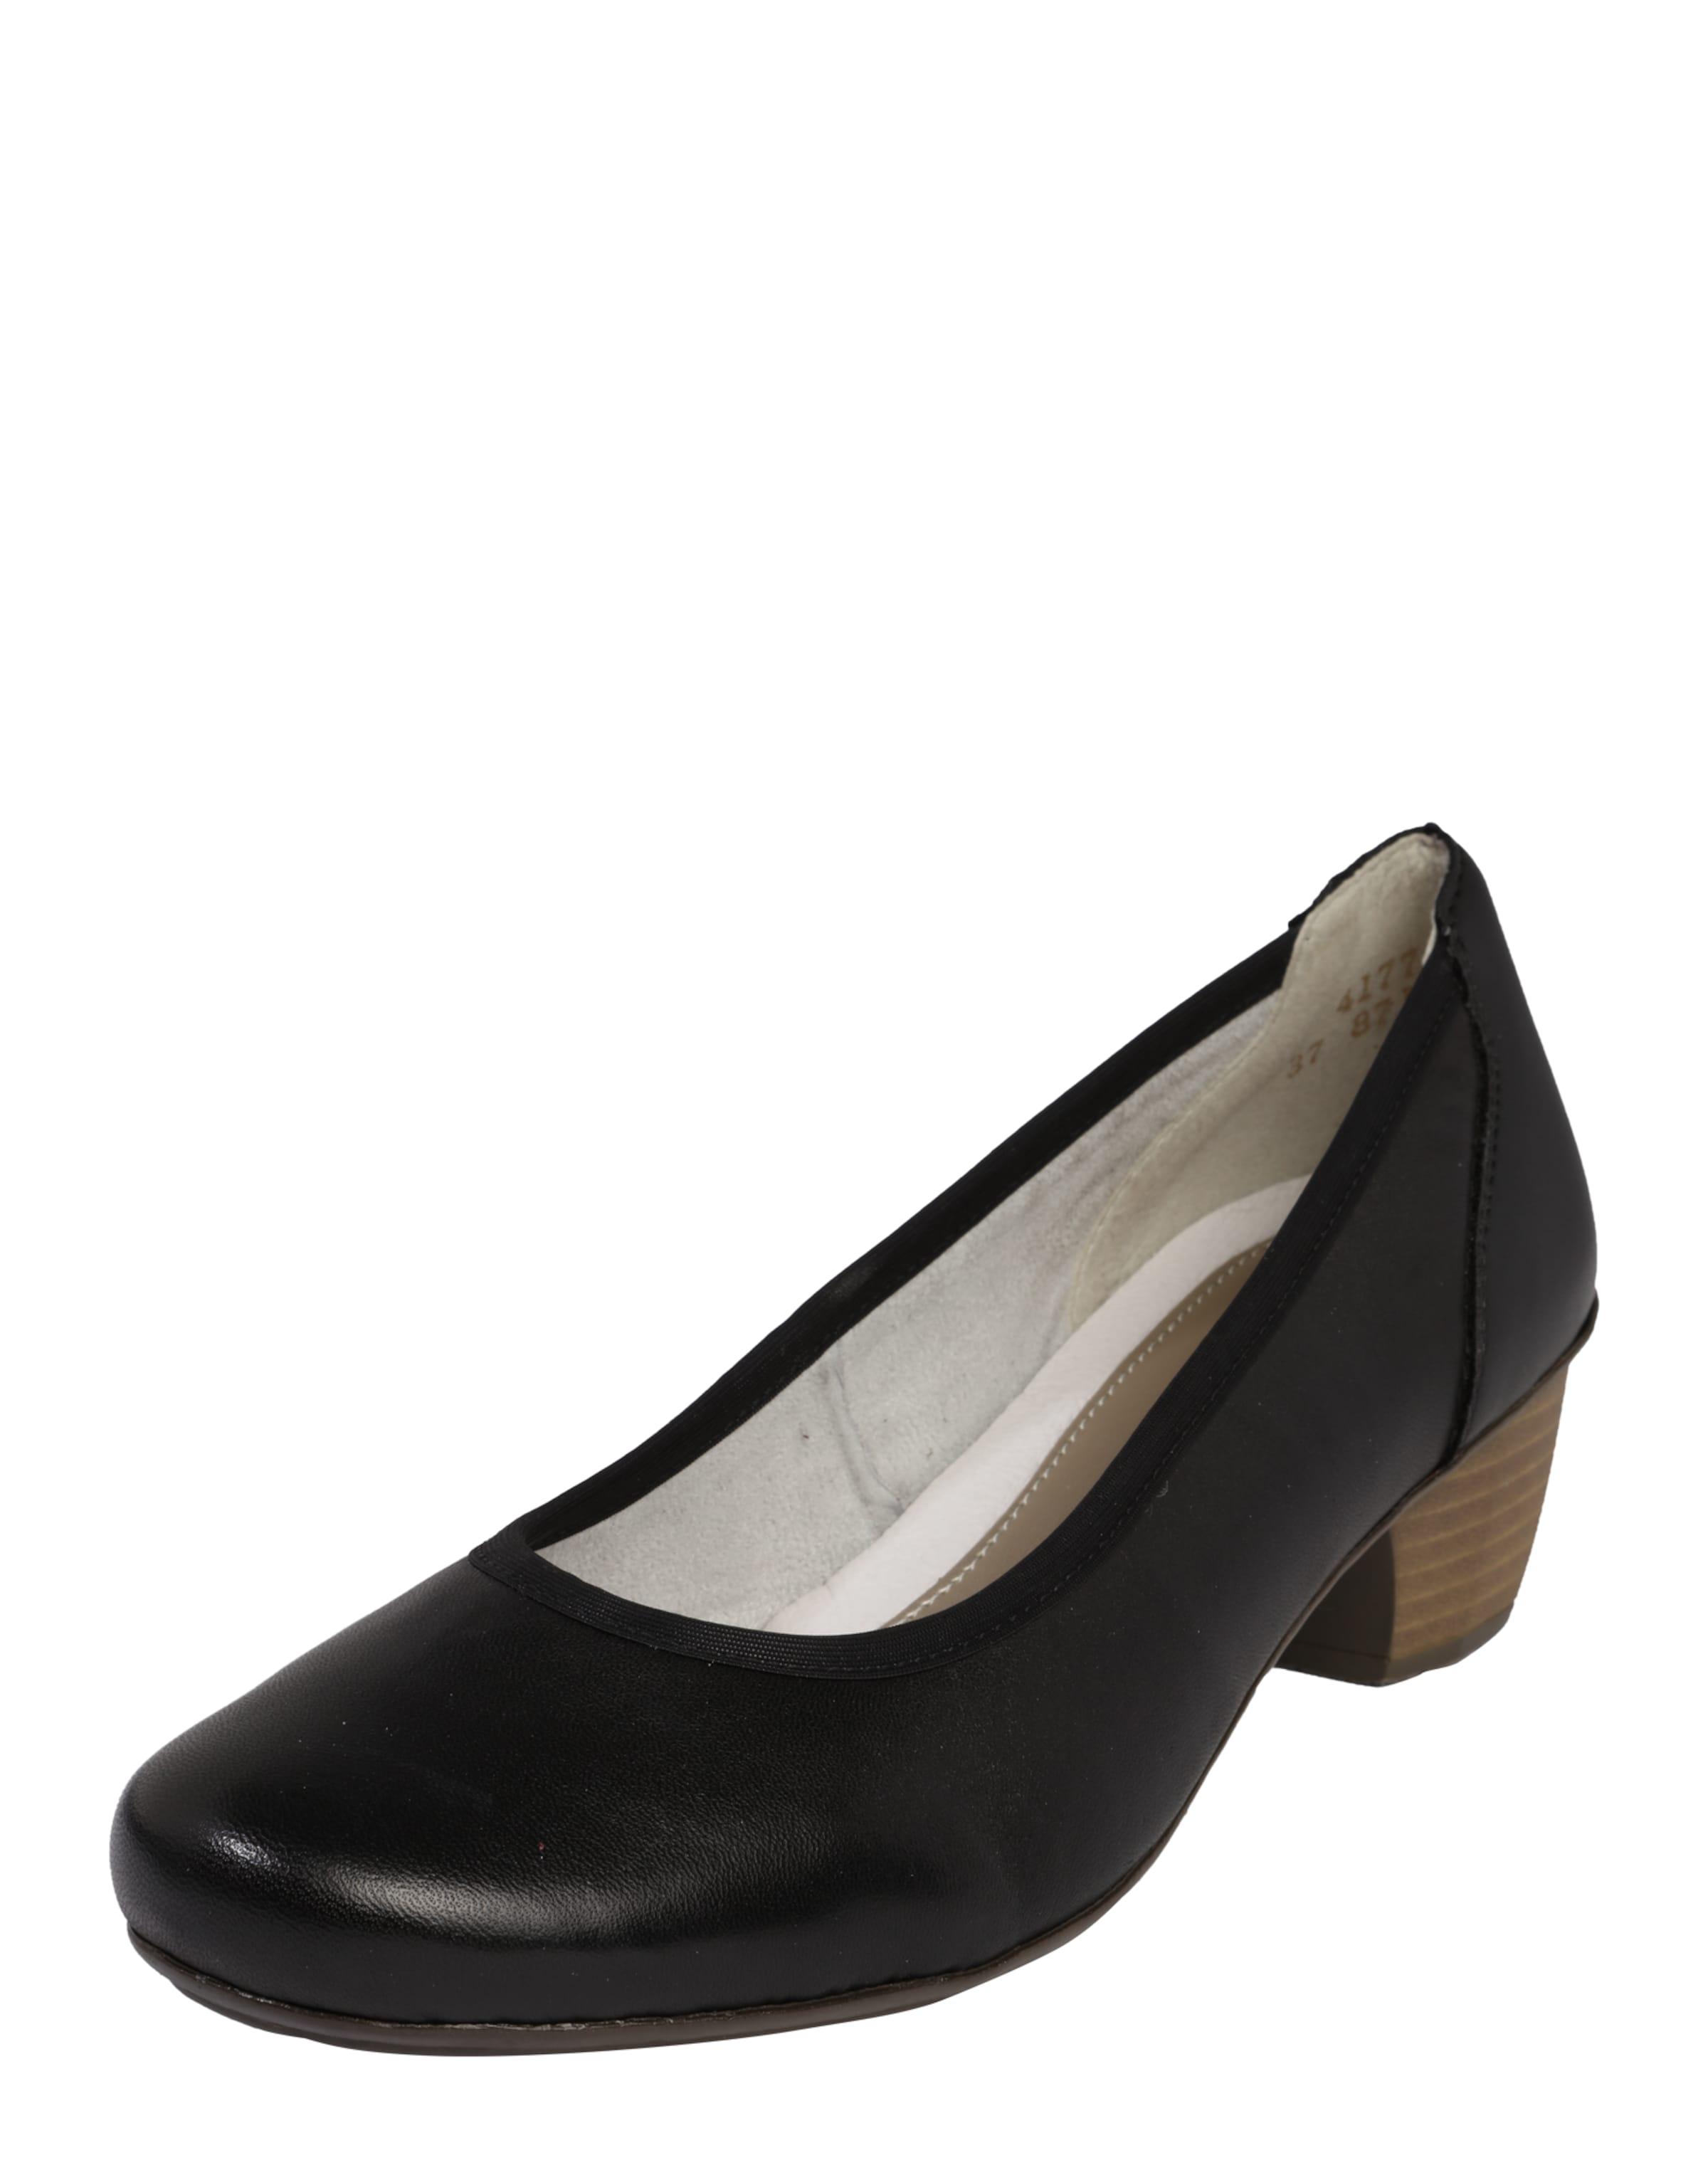 Schuhe adidas Varial Low CQ1146 DgsogrBlubirFtwwht